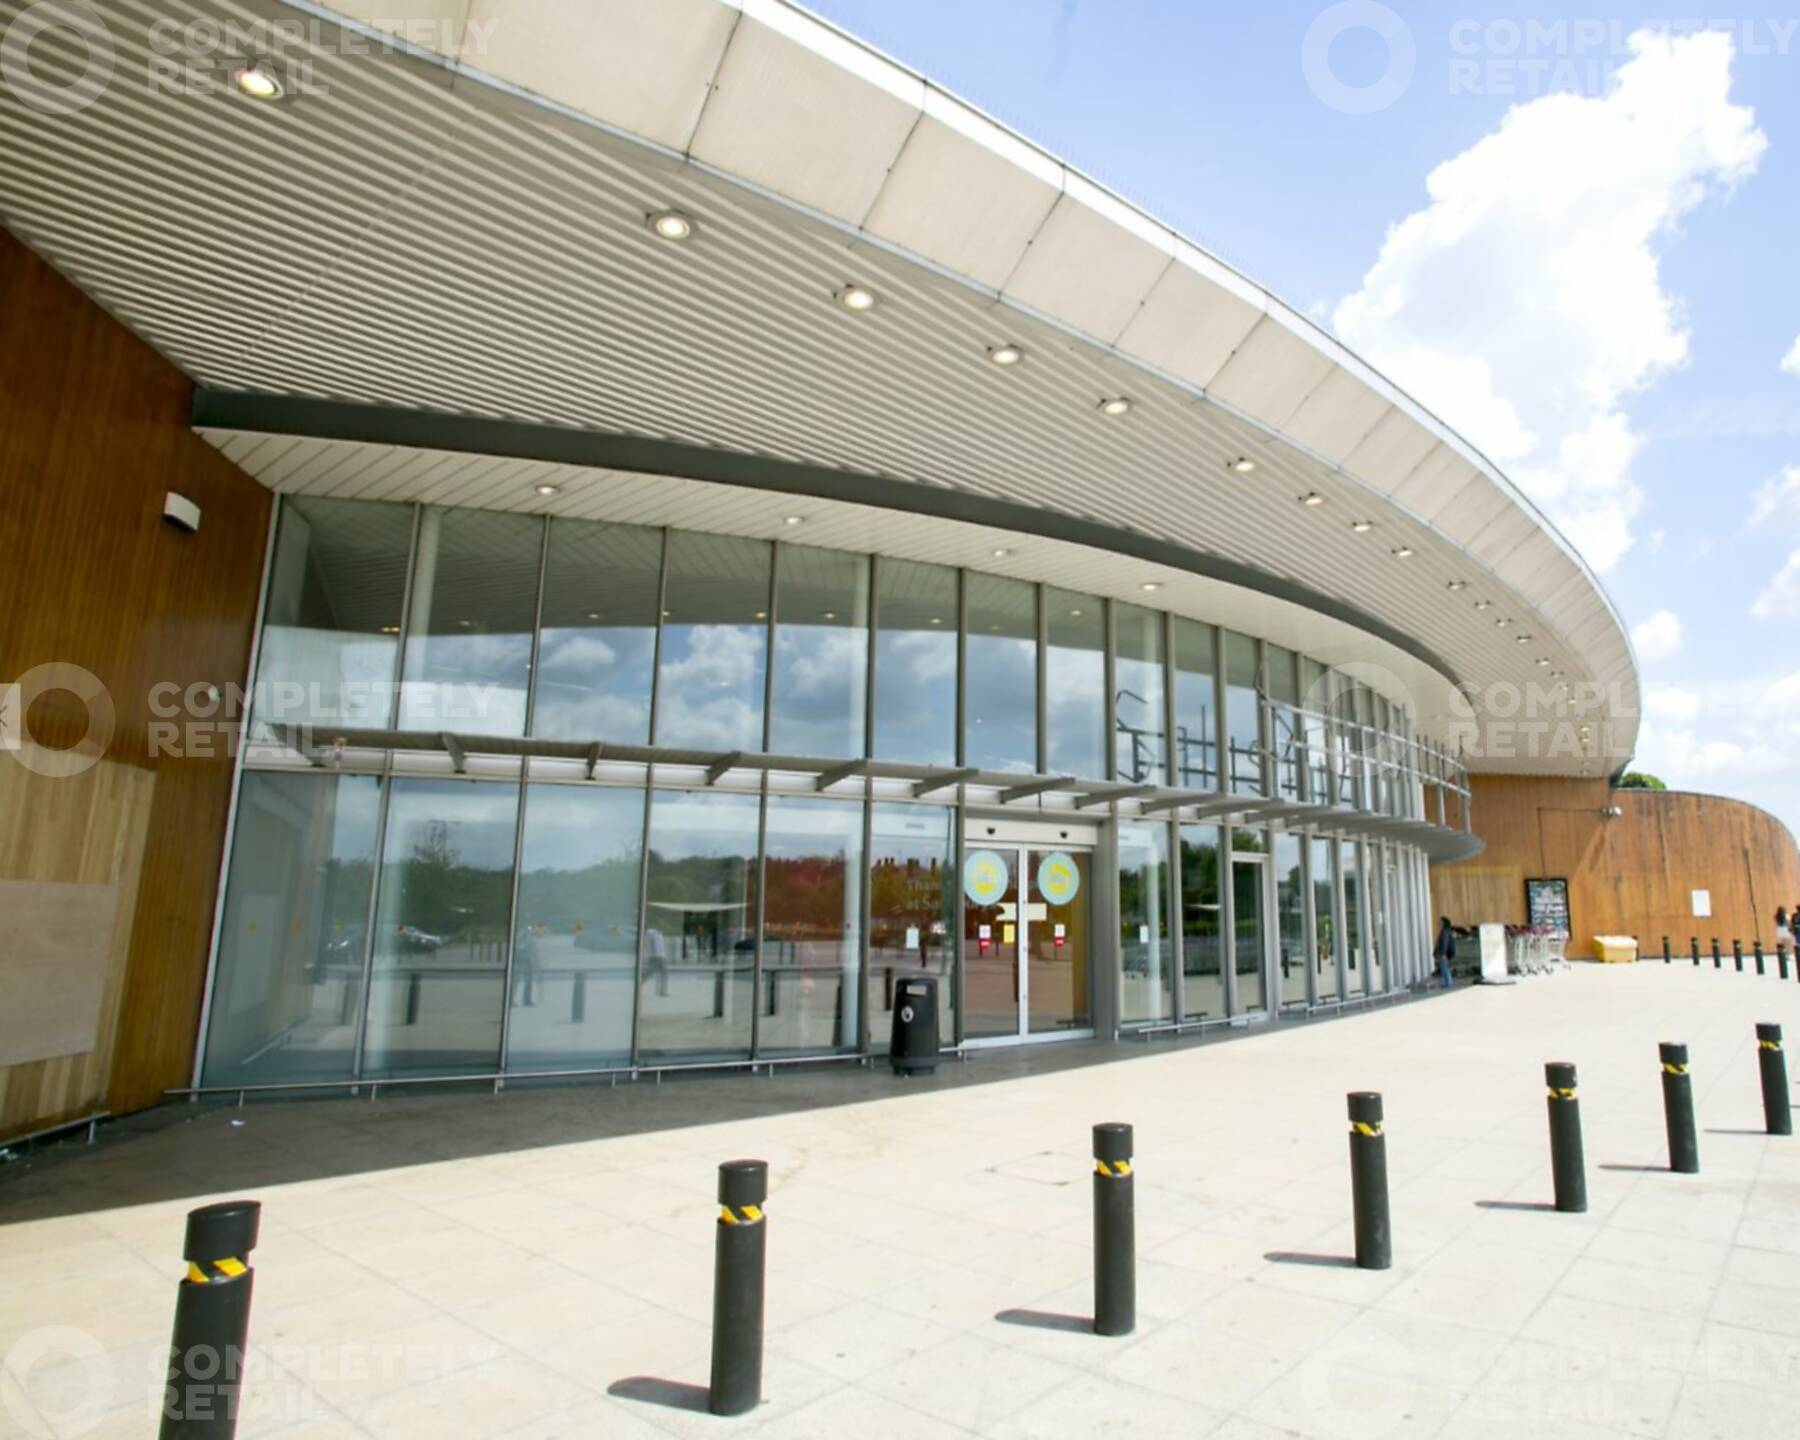 Millennium Way Retail Park